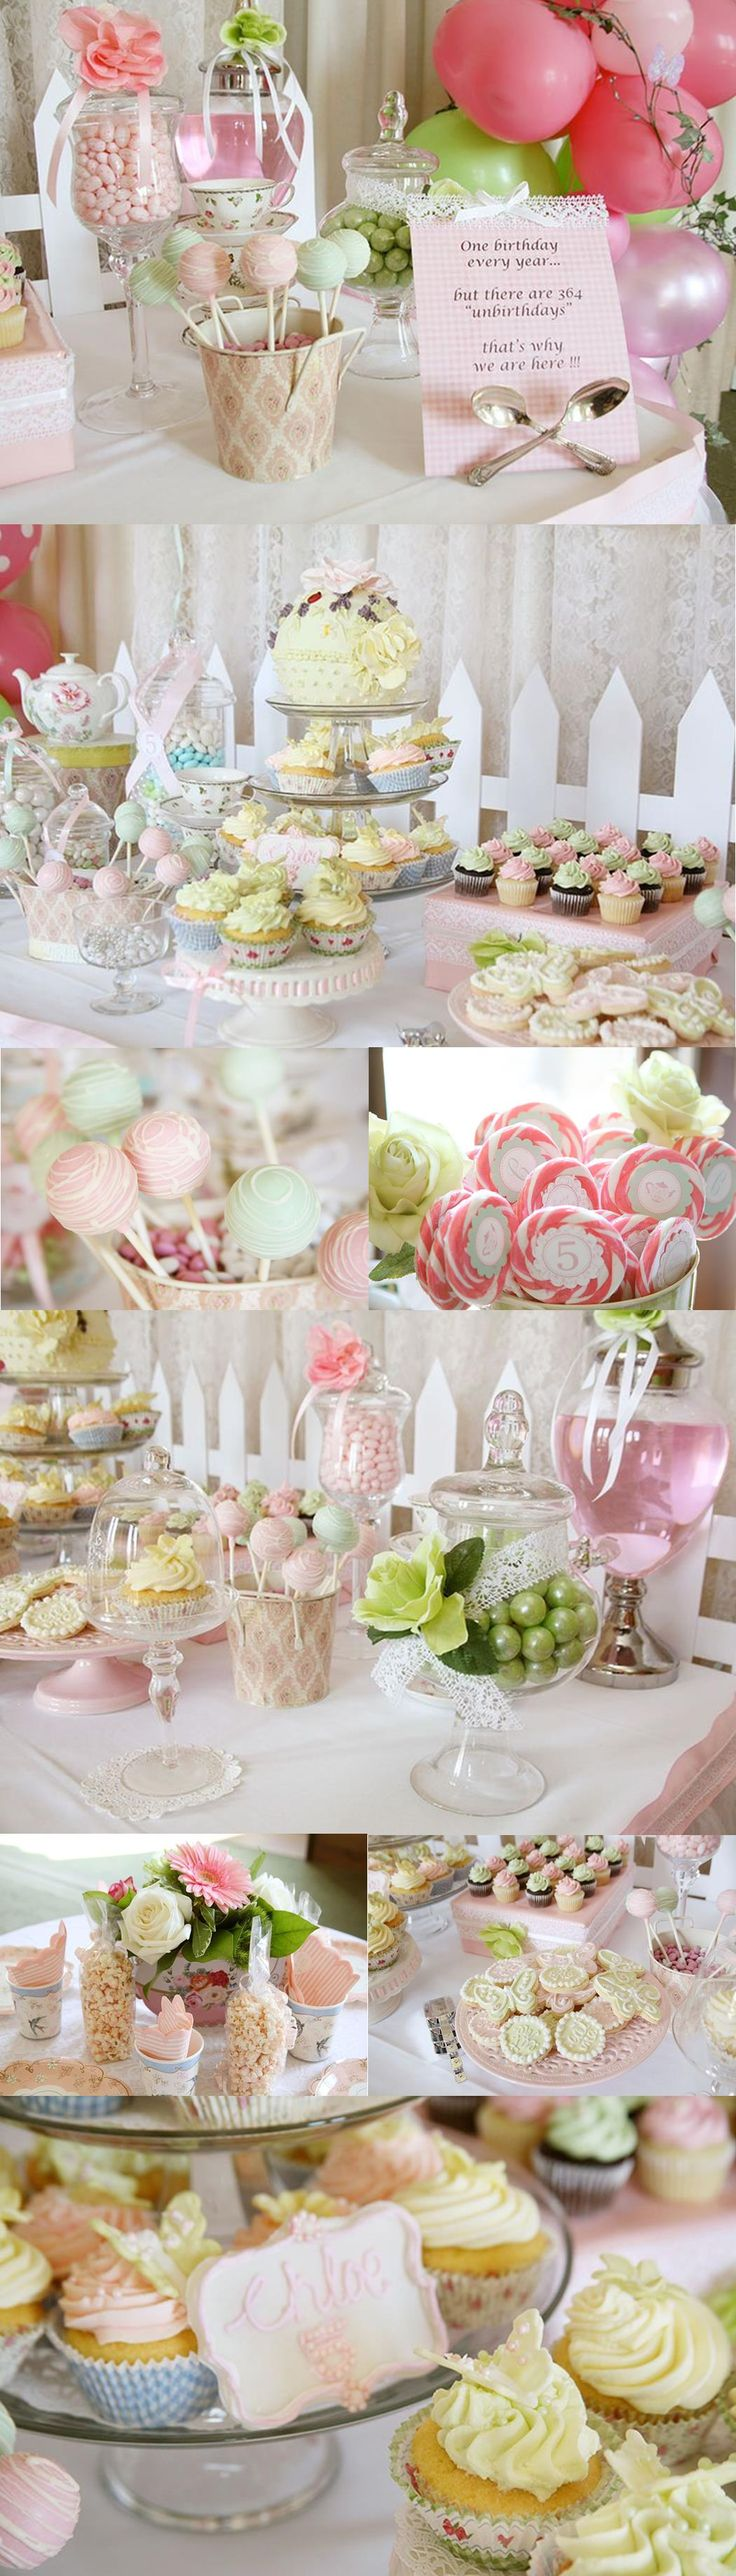 Tea party ideas ....///www.annmeyersignatureevents.com